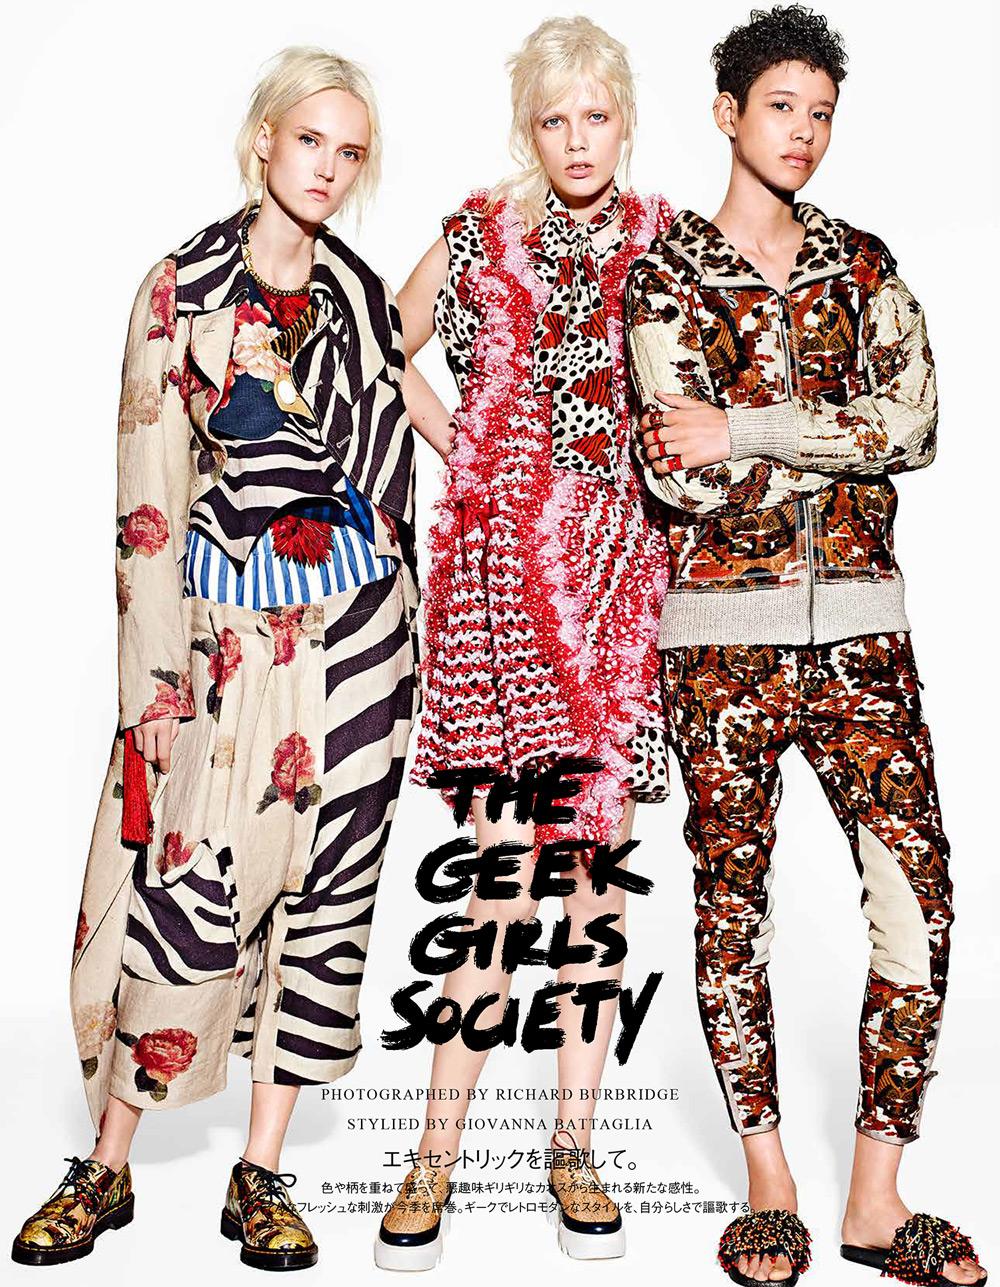 Giovanna-Battaglia-Vogue-Japan-The-Geek-Girls-Society-Richard-Brubridge-0.jpg